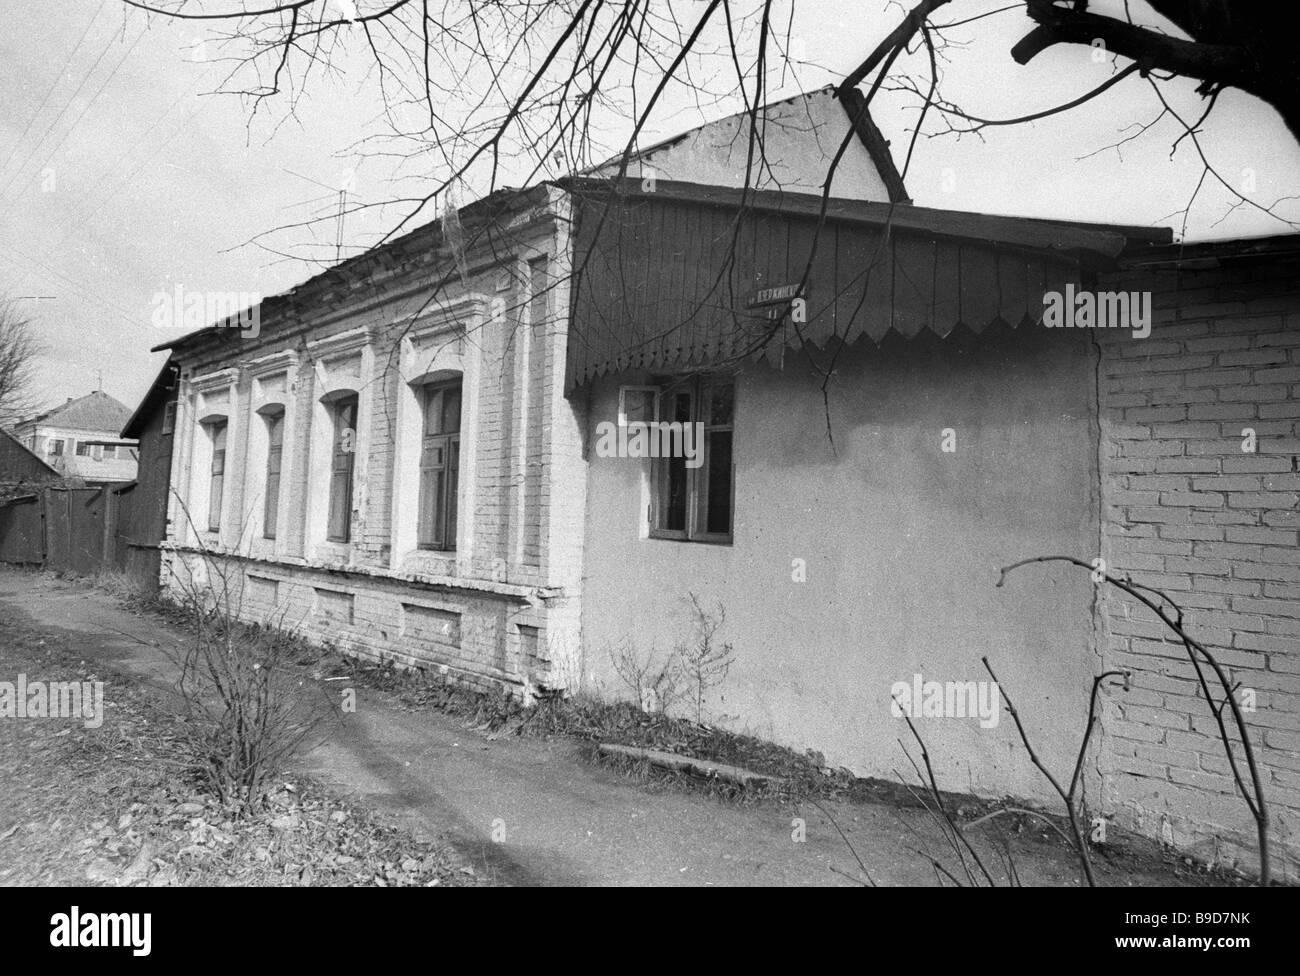 L'artista Marc Chagall s house di Vitebsk Immagini Stock